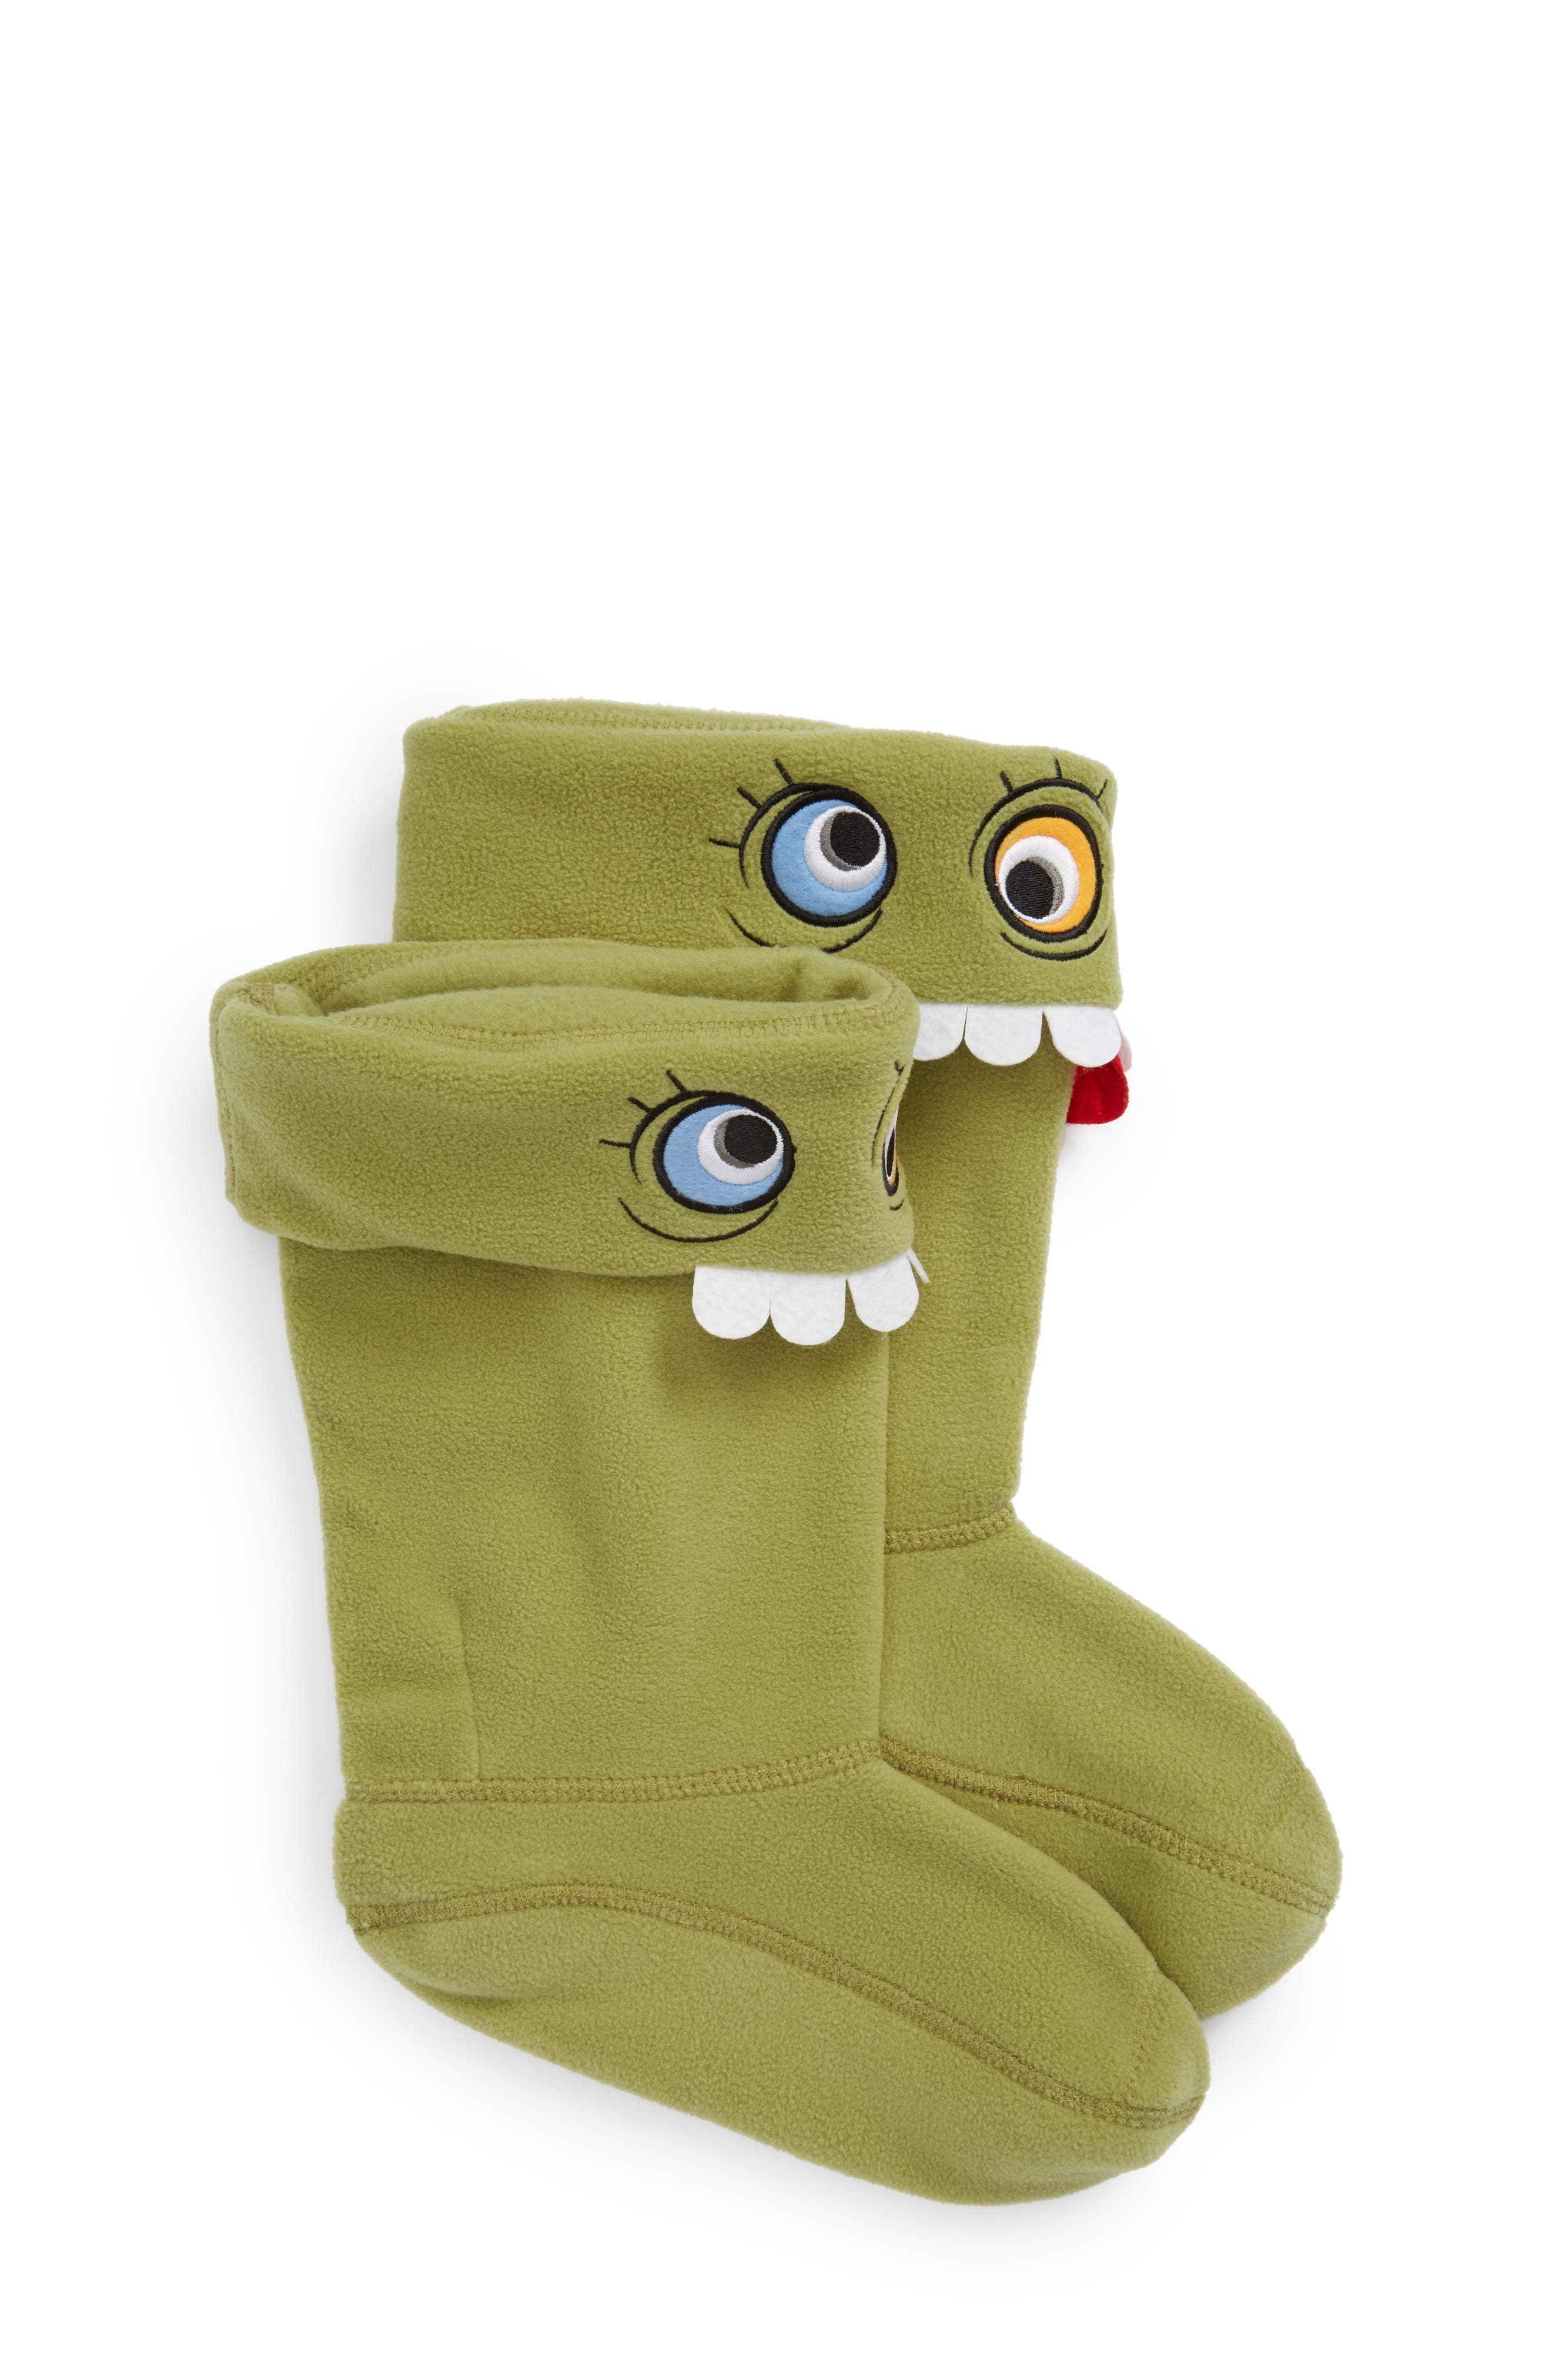 Alien Cuff Boot Socks,                         Main,                         color,